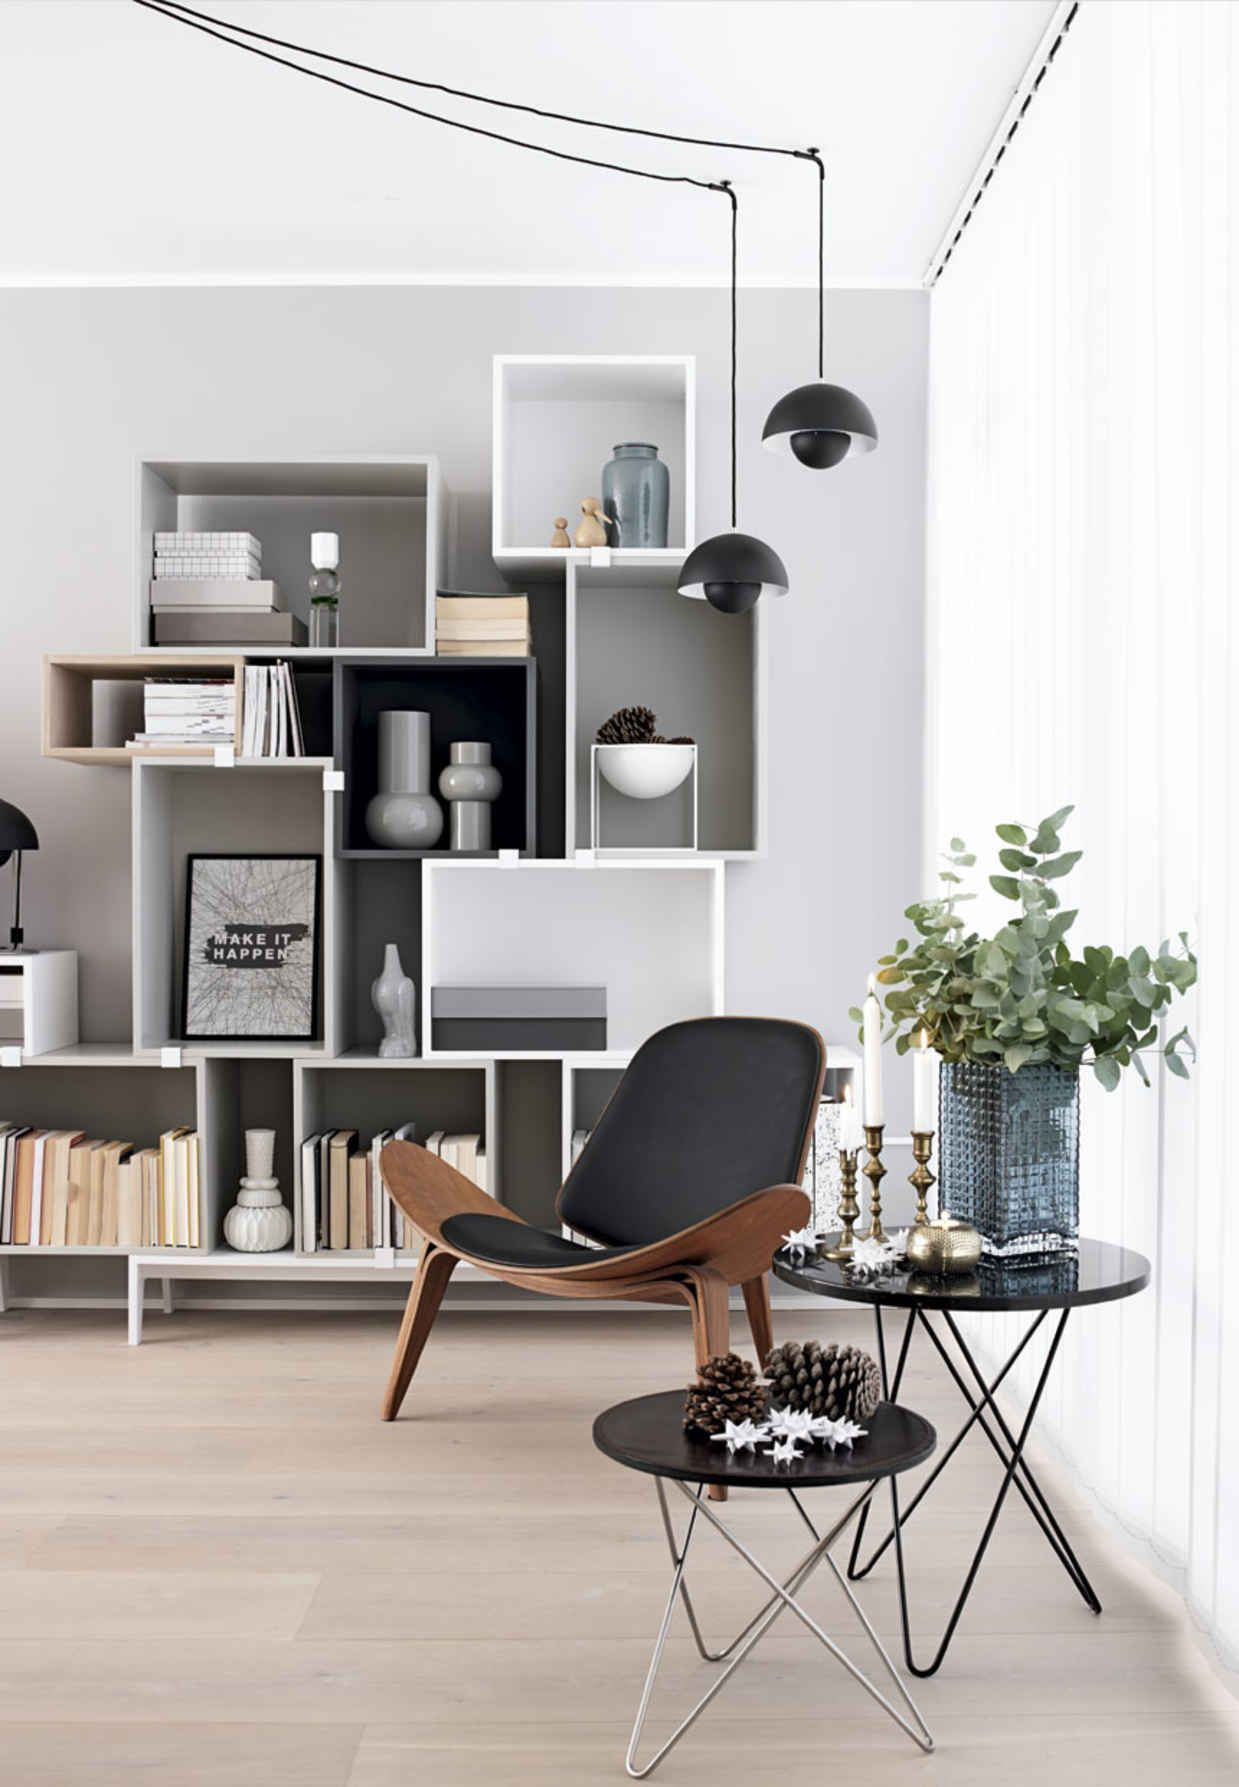 50 Examples Of Beautiful Scandinavian Interior Design インテリア